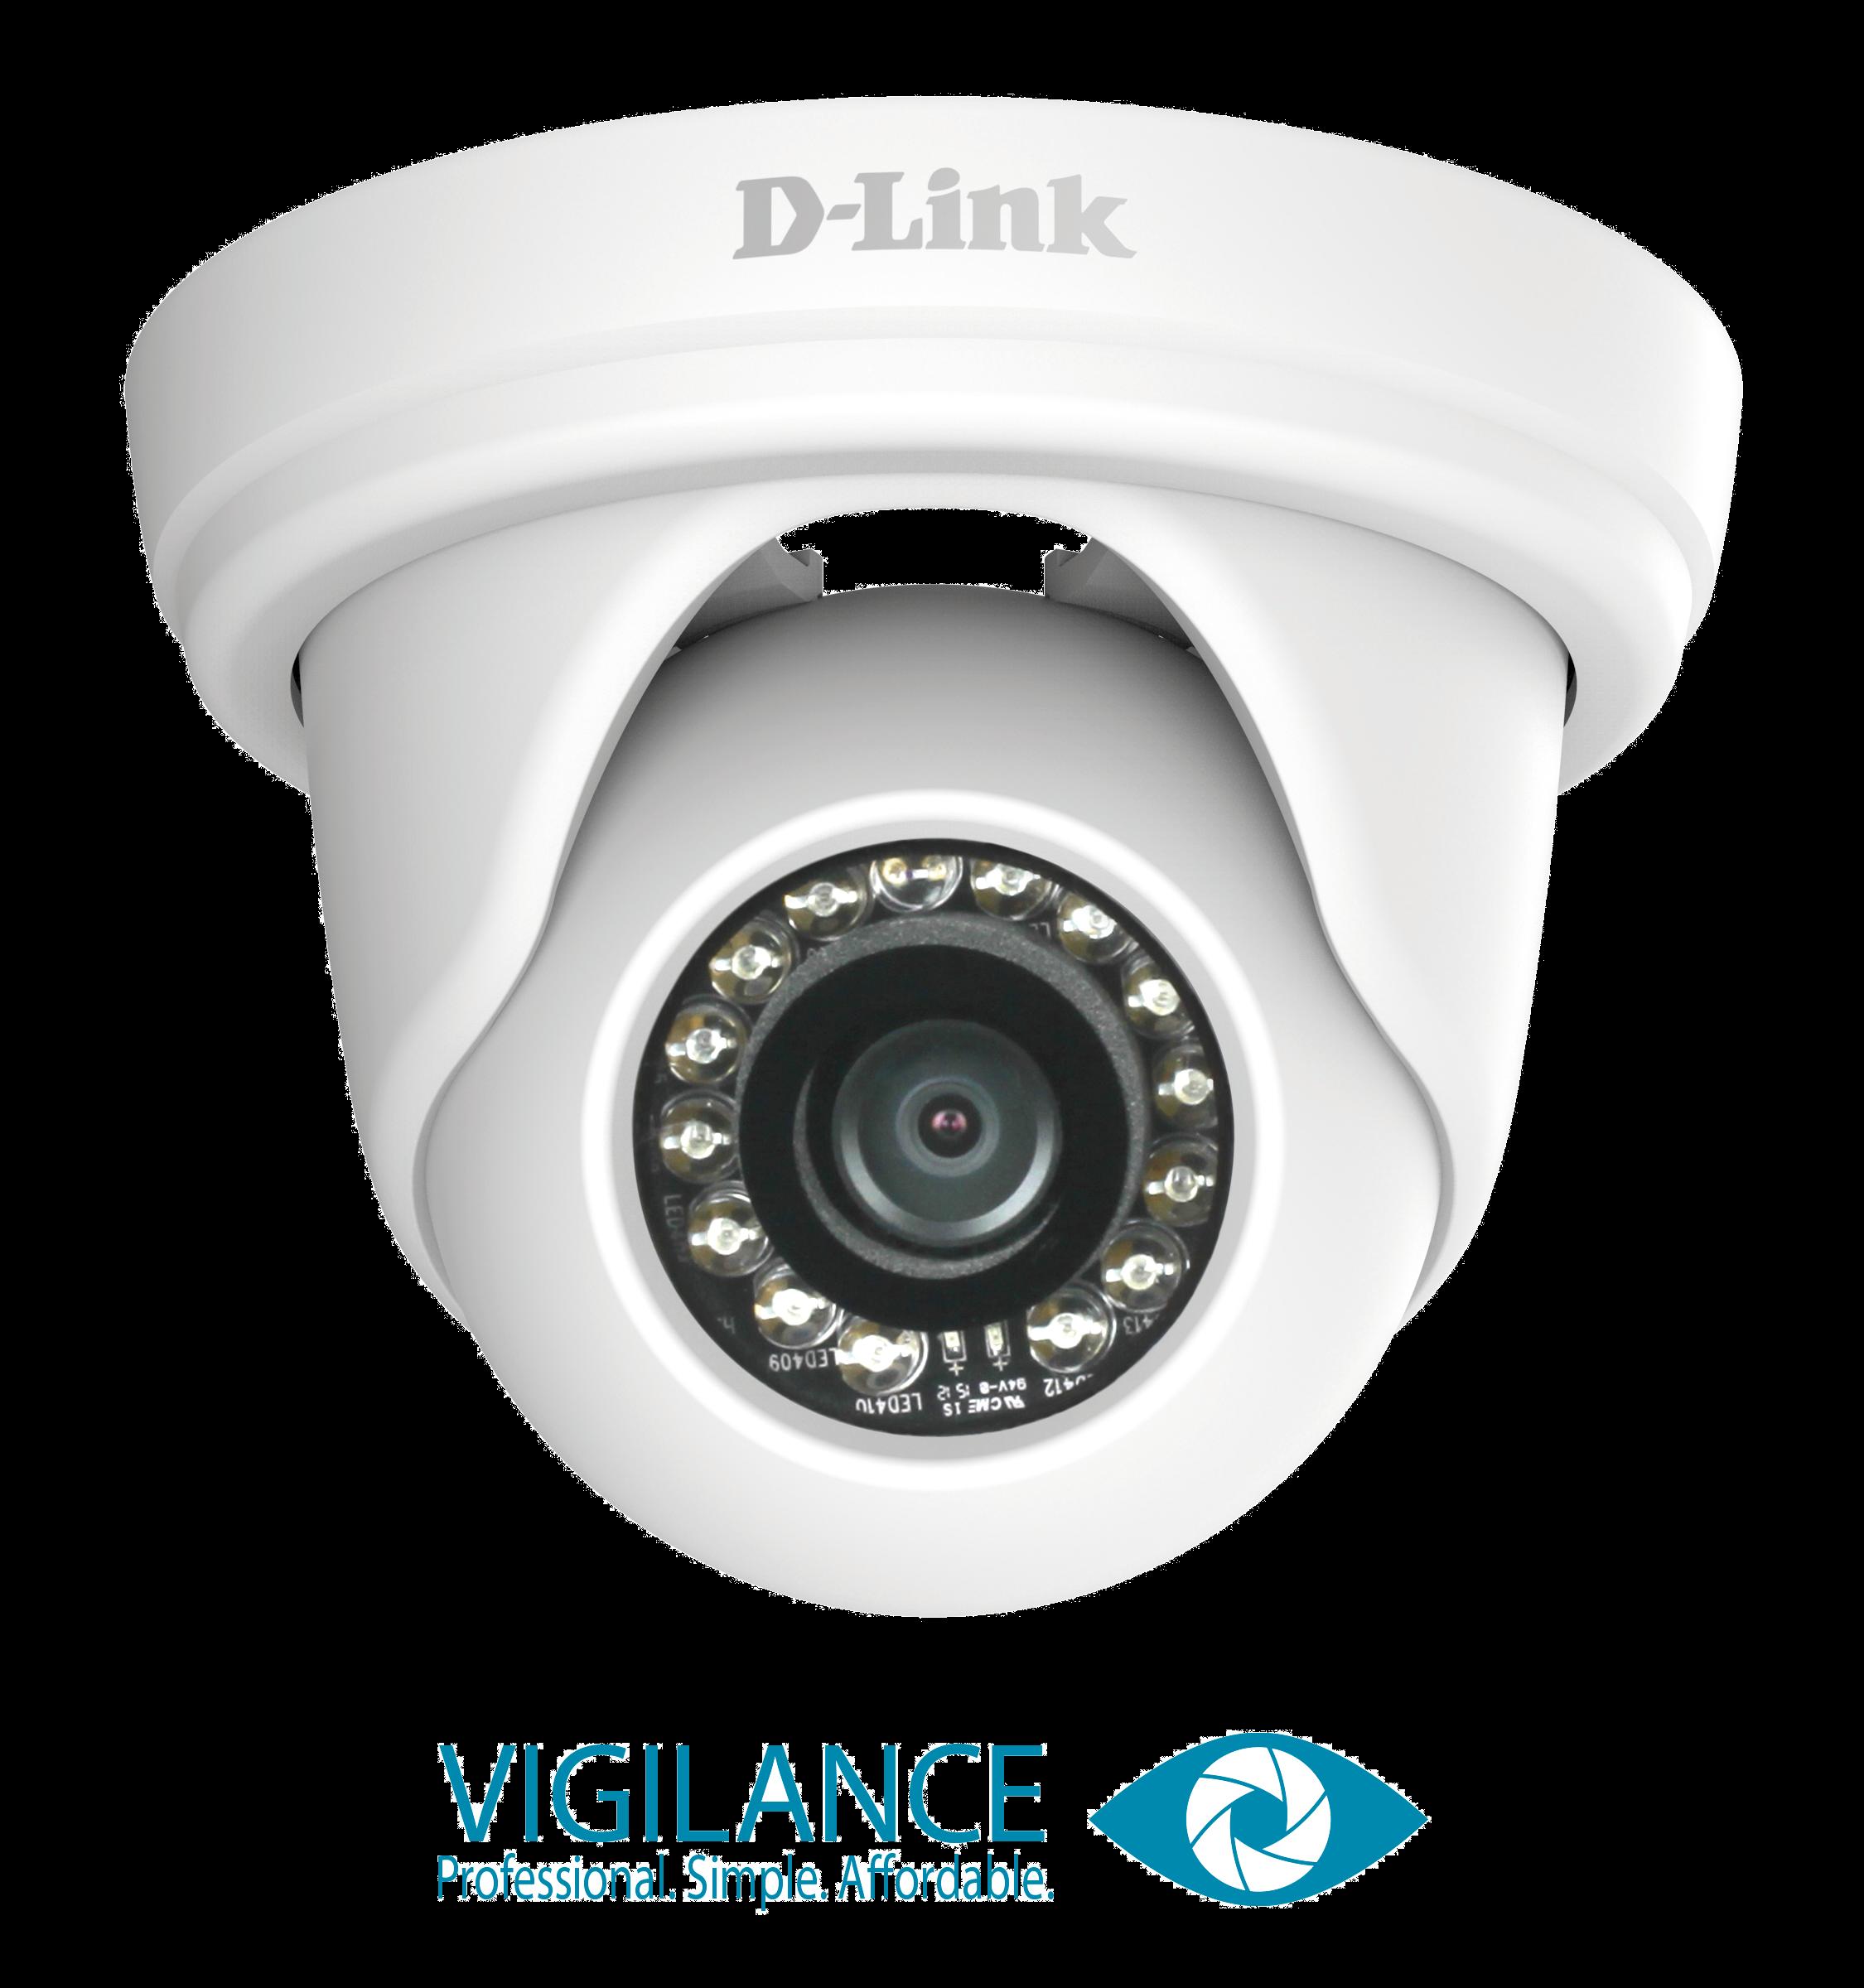 d link now shipping 360 degree full hd outdoor vigilance. Black Bedroom Furniture Sets. Home Design Ideas